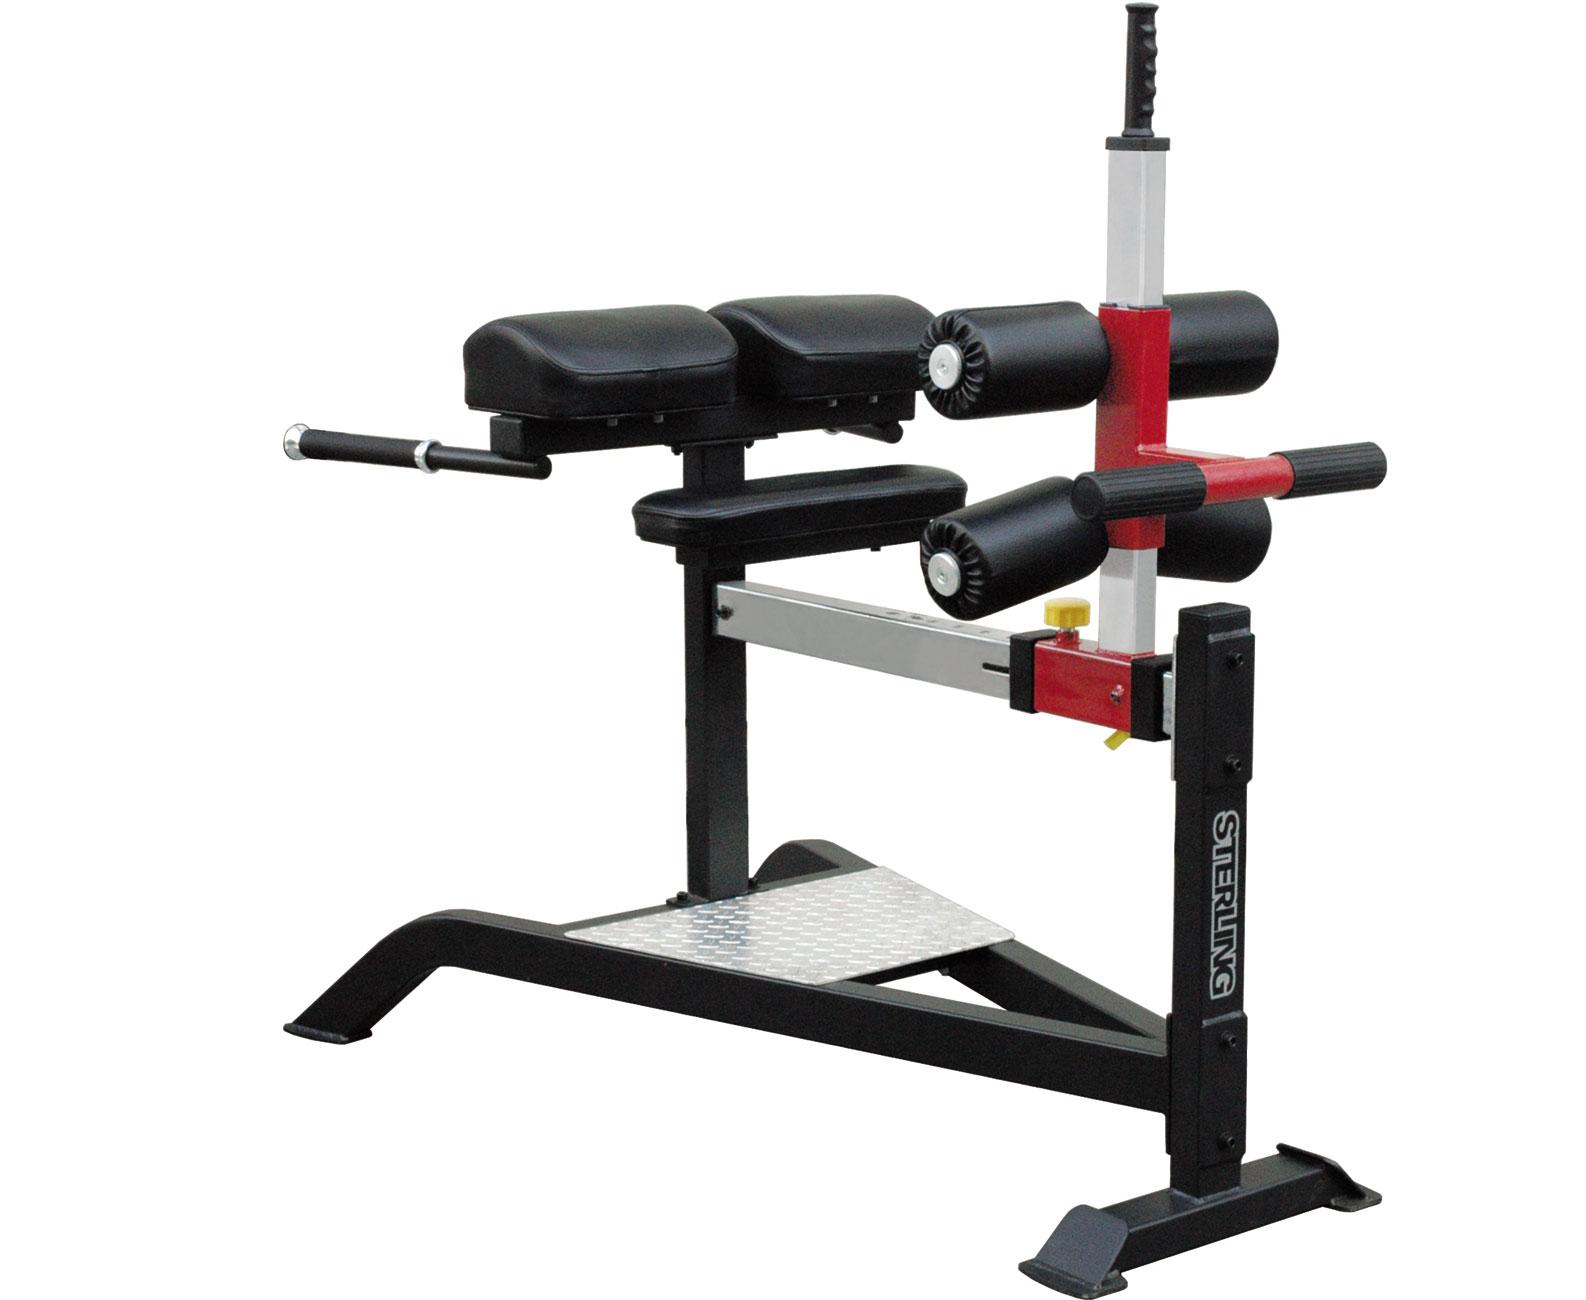 Aparat hiperextensii profesional, SL 7013, Impulse Fitness